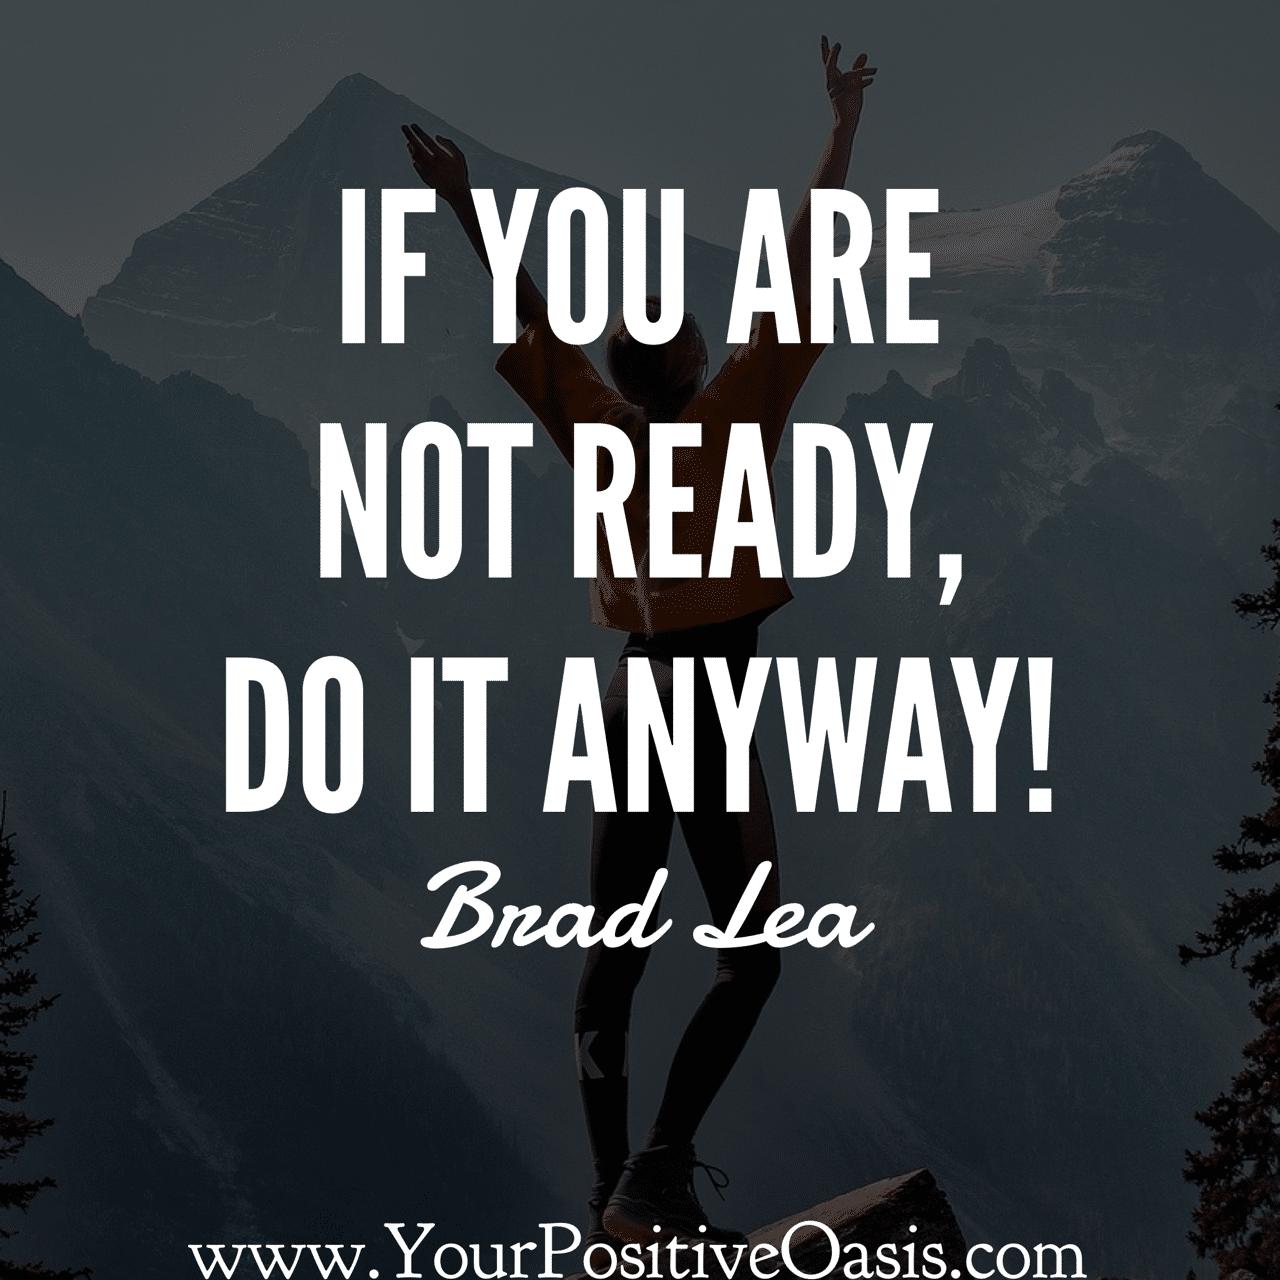 Brad Lea Quotes